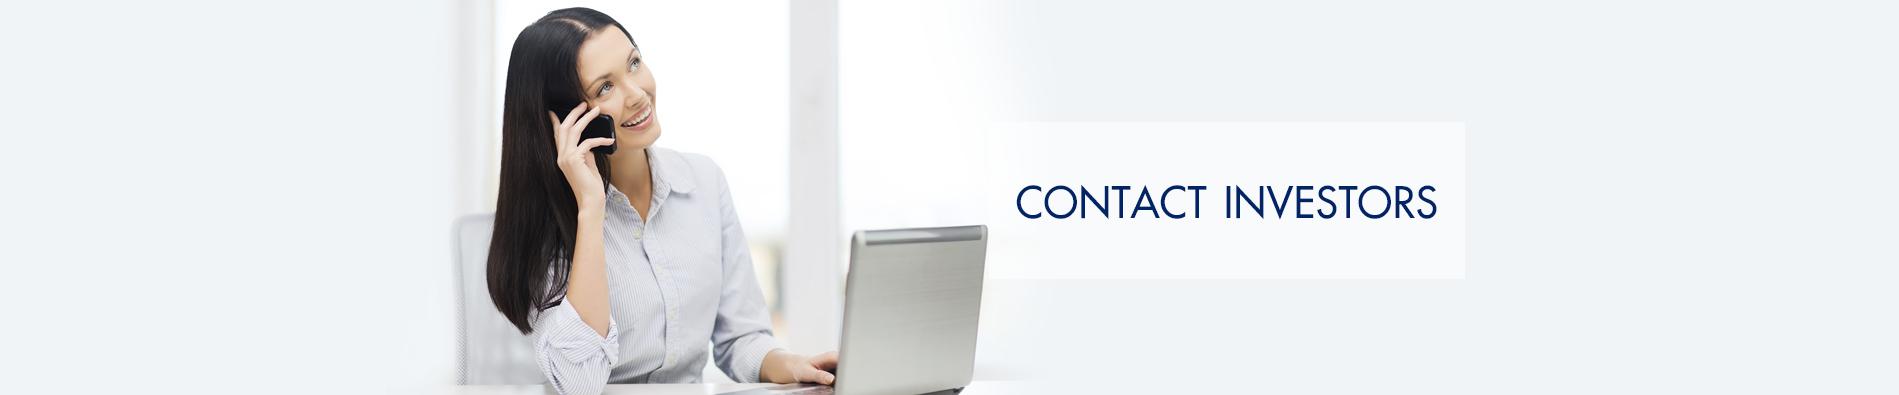 Banner Contact Investors